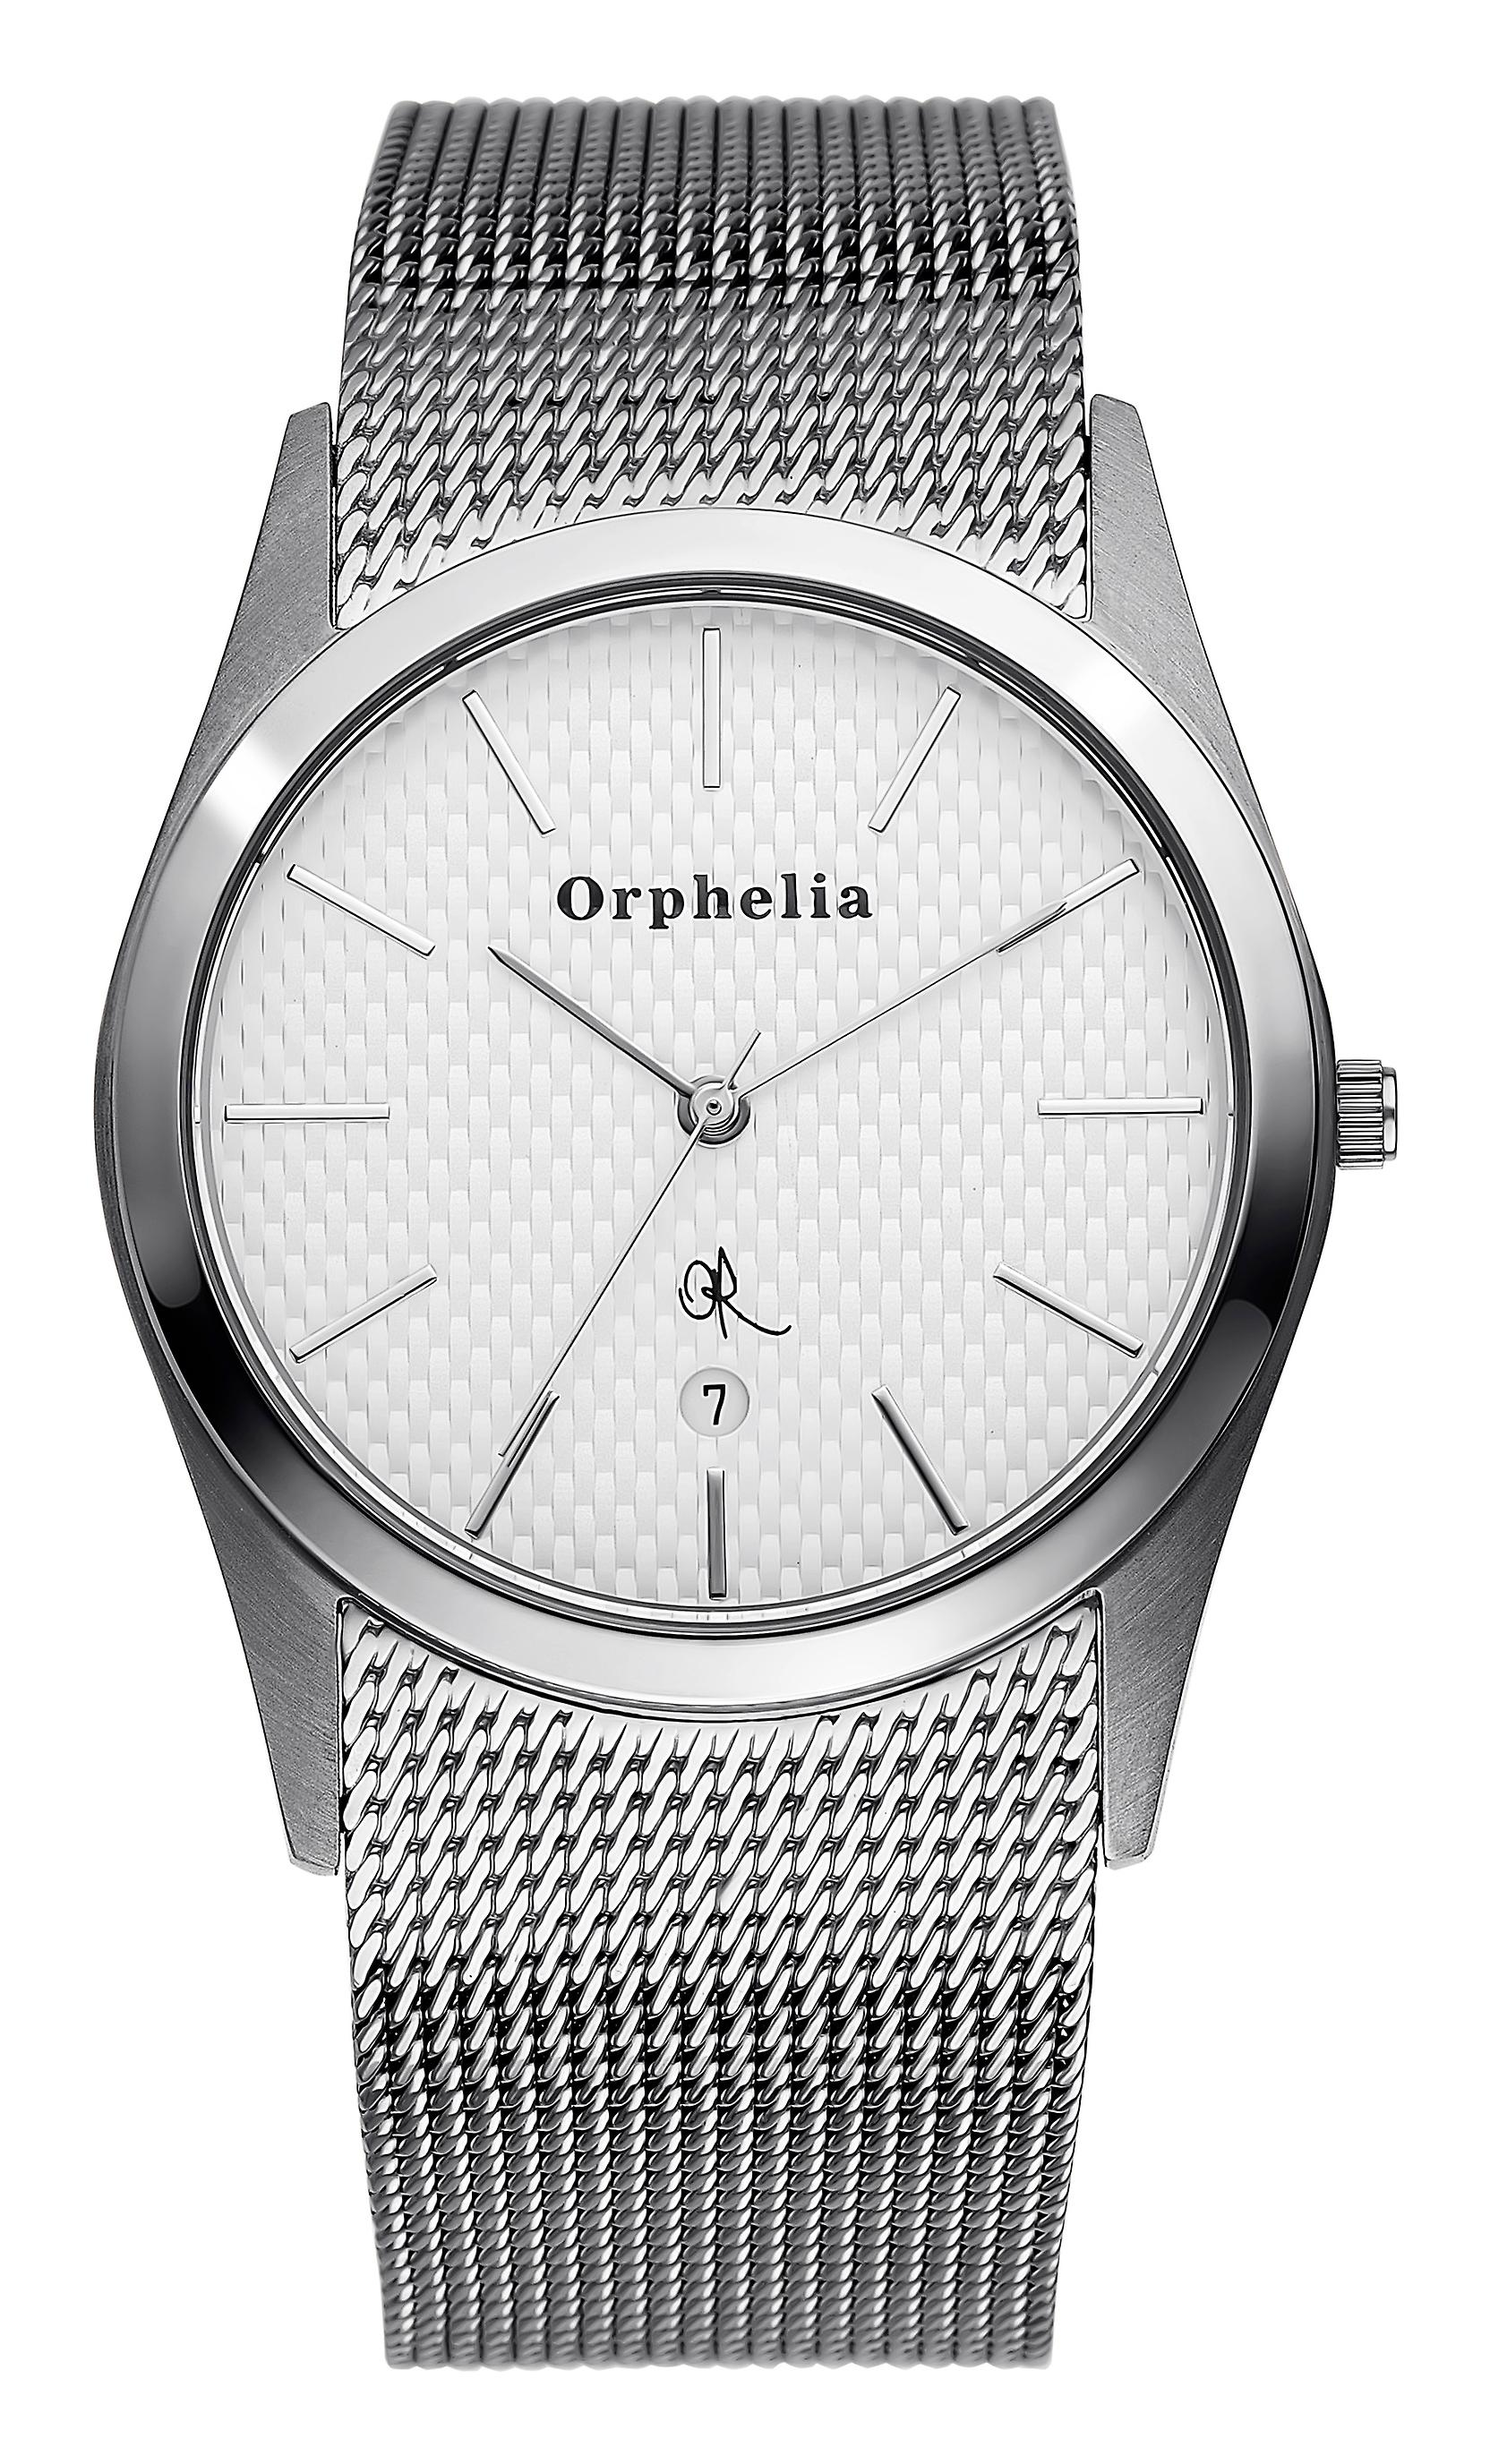 ORPHELIA Mens Analogue Watch Mesh Up argento acciaio inox 122-7701-88